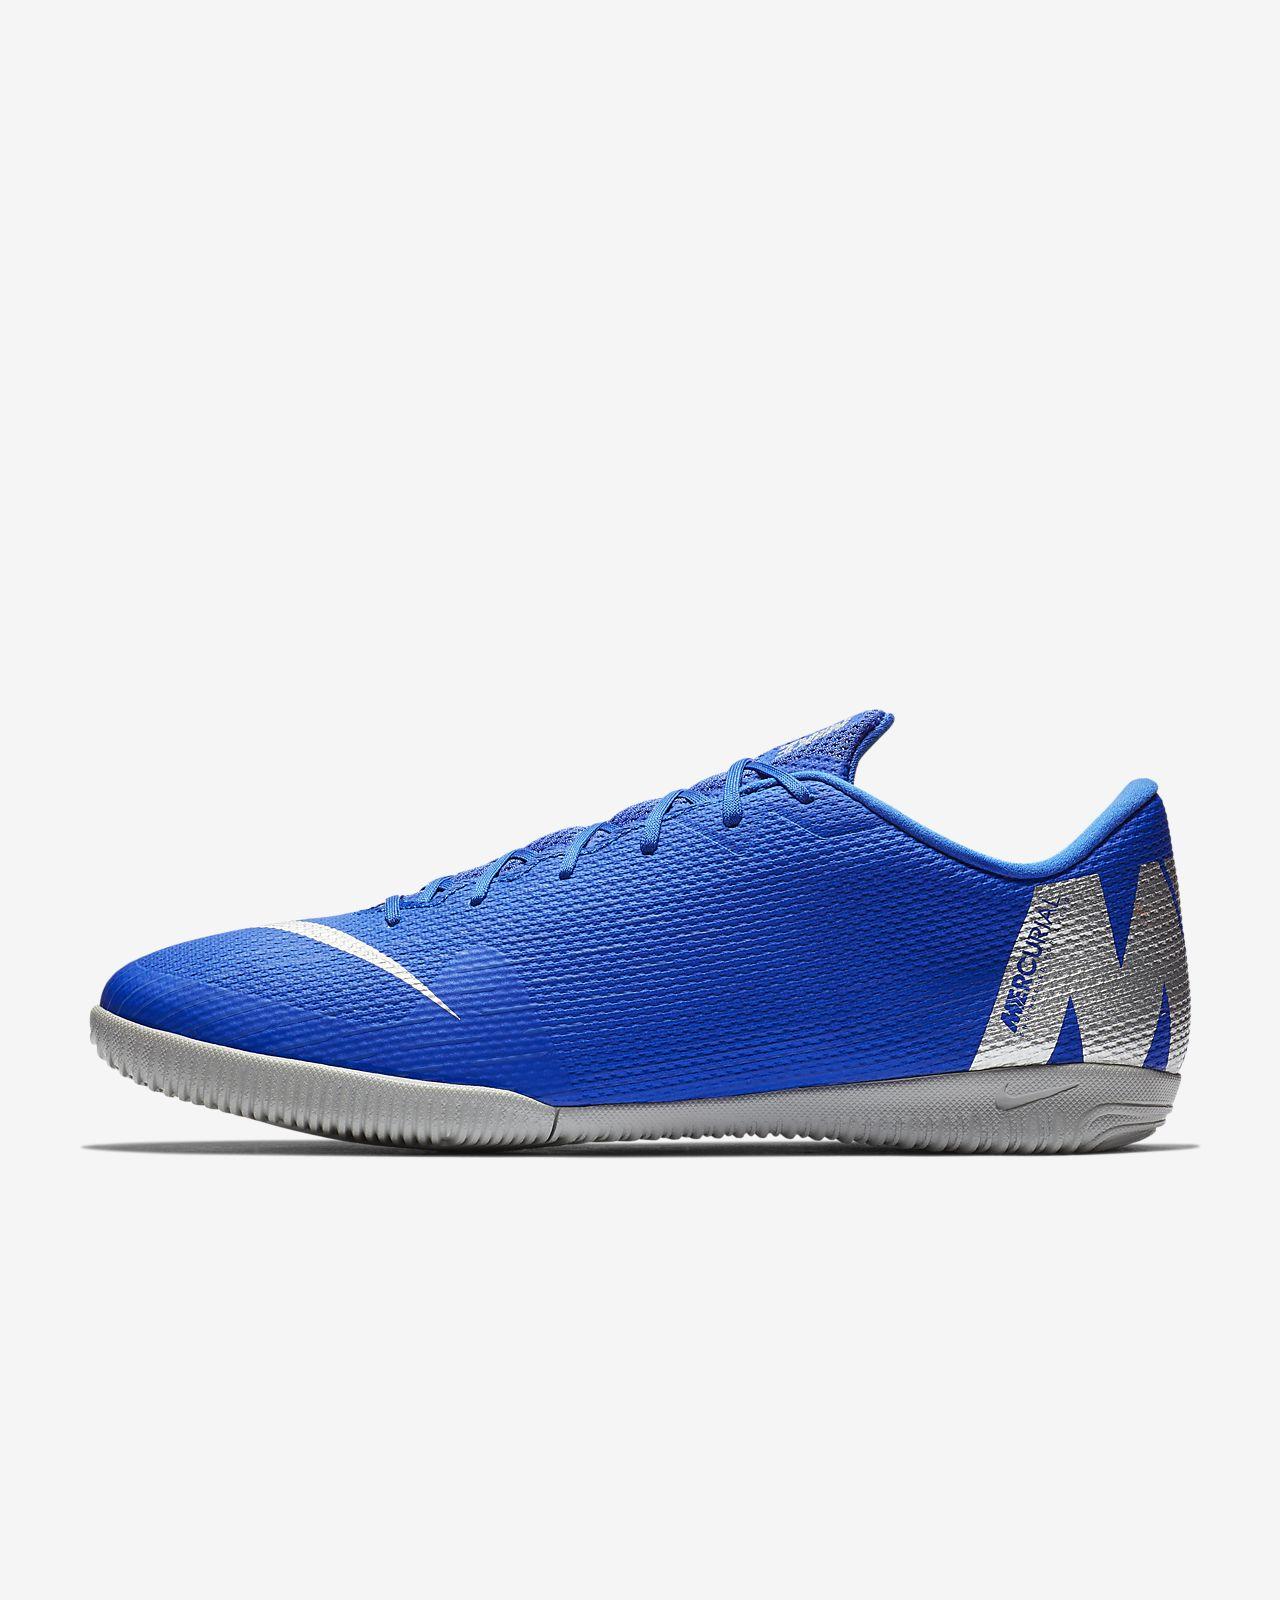 Vaporx En Nike Ic Academy De Football Chaussure Salle À 12 Crampons 6x0EwqaW